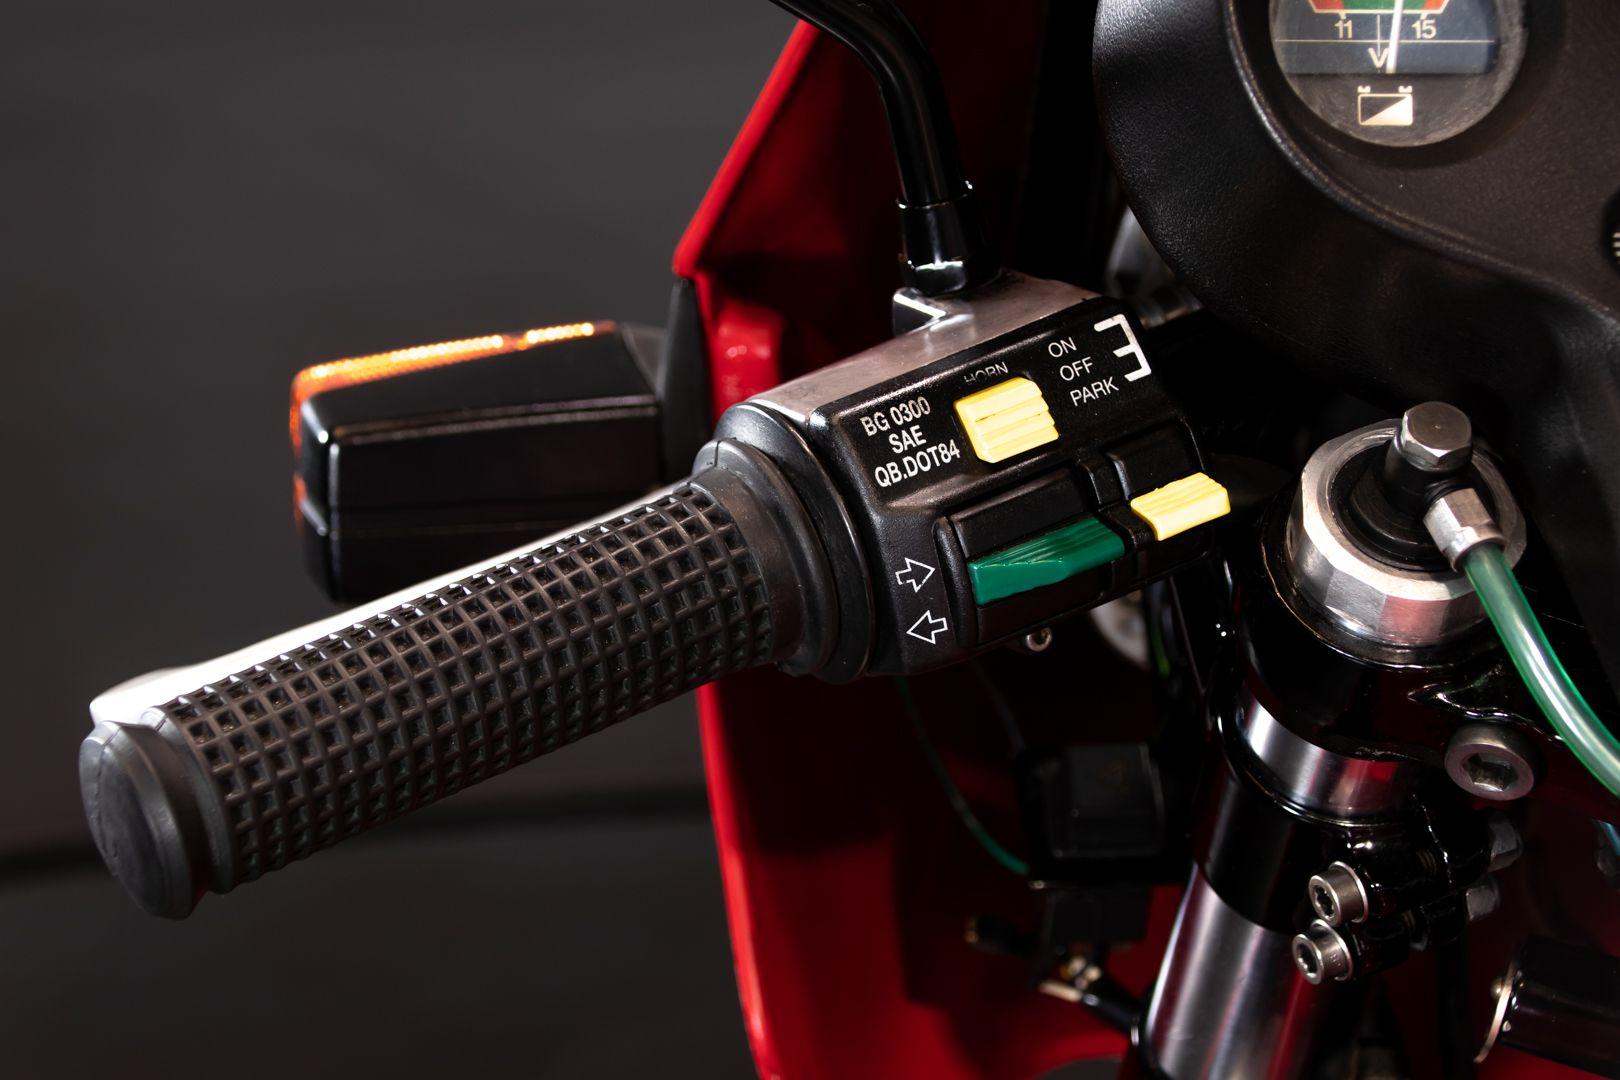 1985 Moto Guzzi le mans 1000 57529